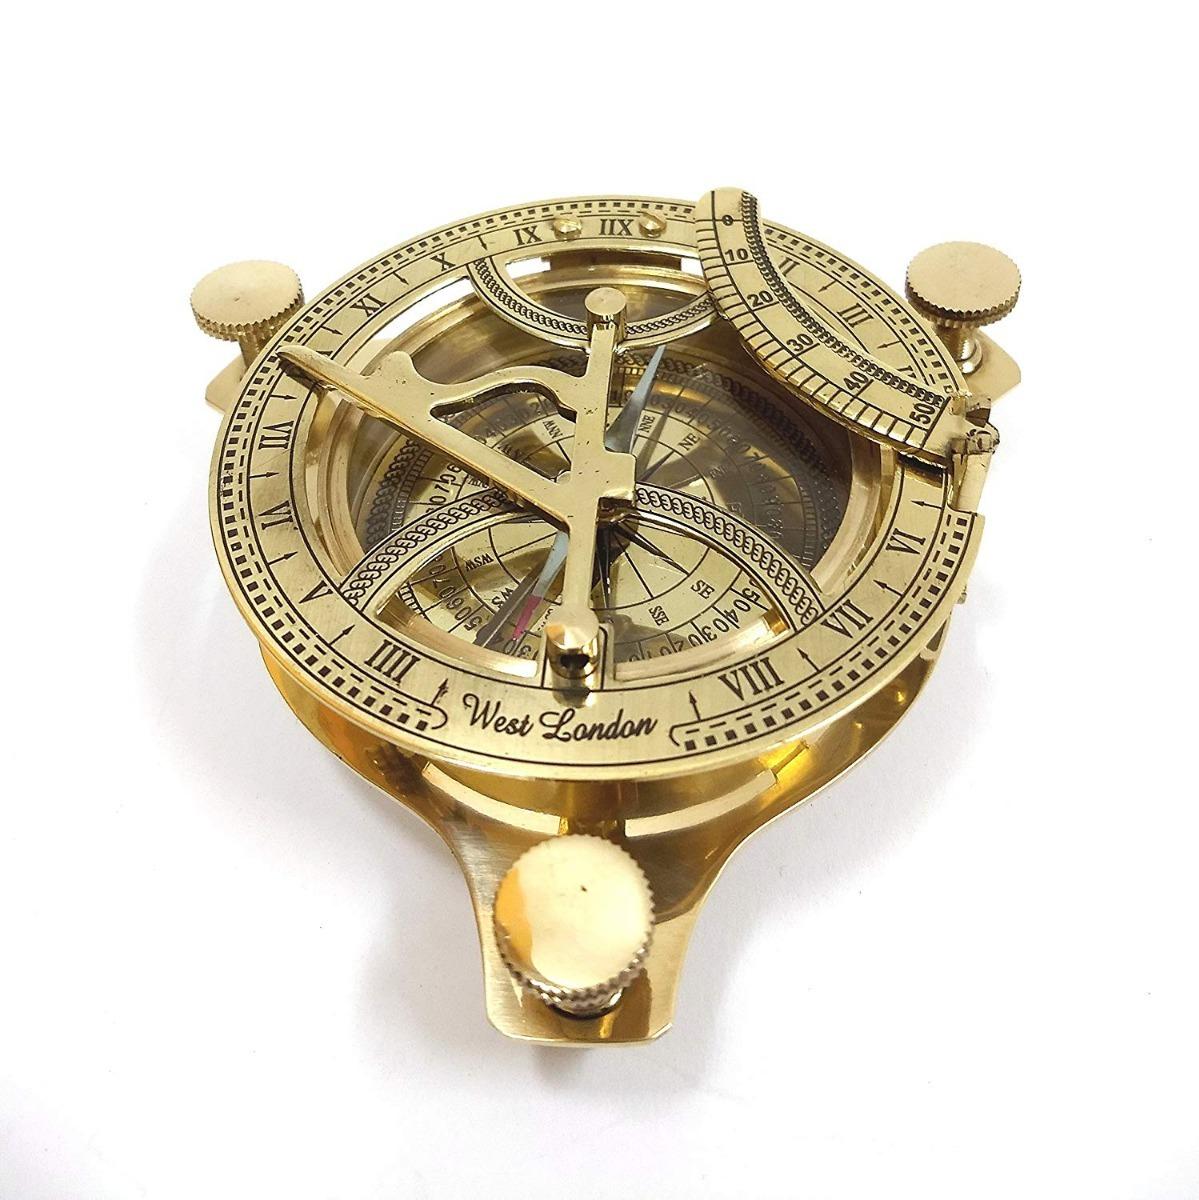 8f9707f9b29d brújula reloj solar náutico antiguo vintage 2019 bronce. Cargando zoom.